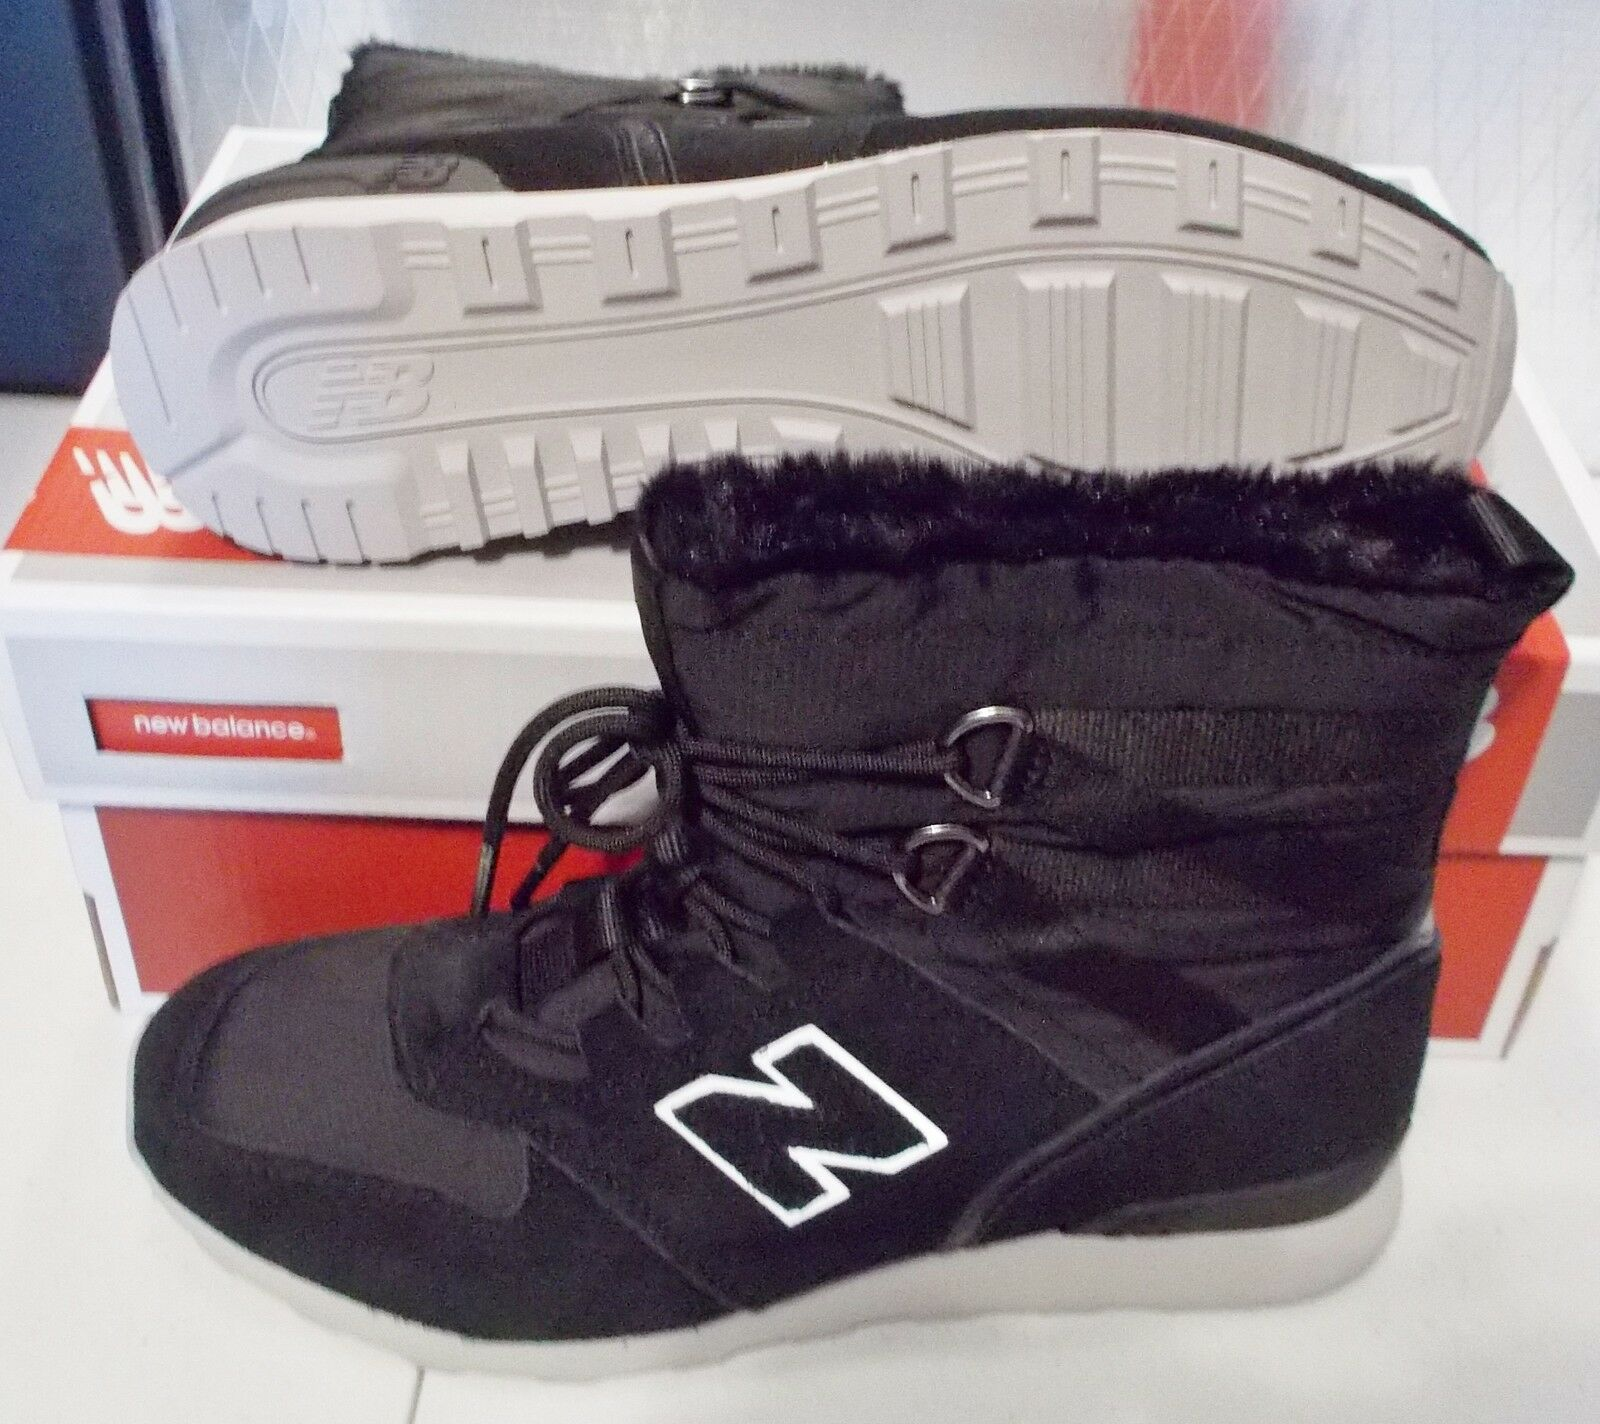 NEW BALANCE 510 Outdoor Sneaker Boot WOMENS B Medium Medium Medium Width Black  105 NIB bd9f2d